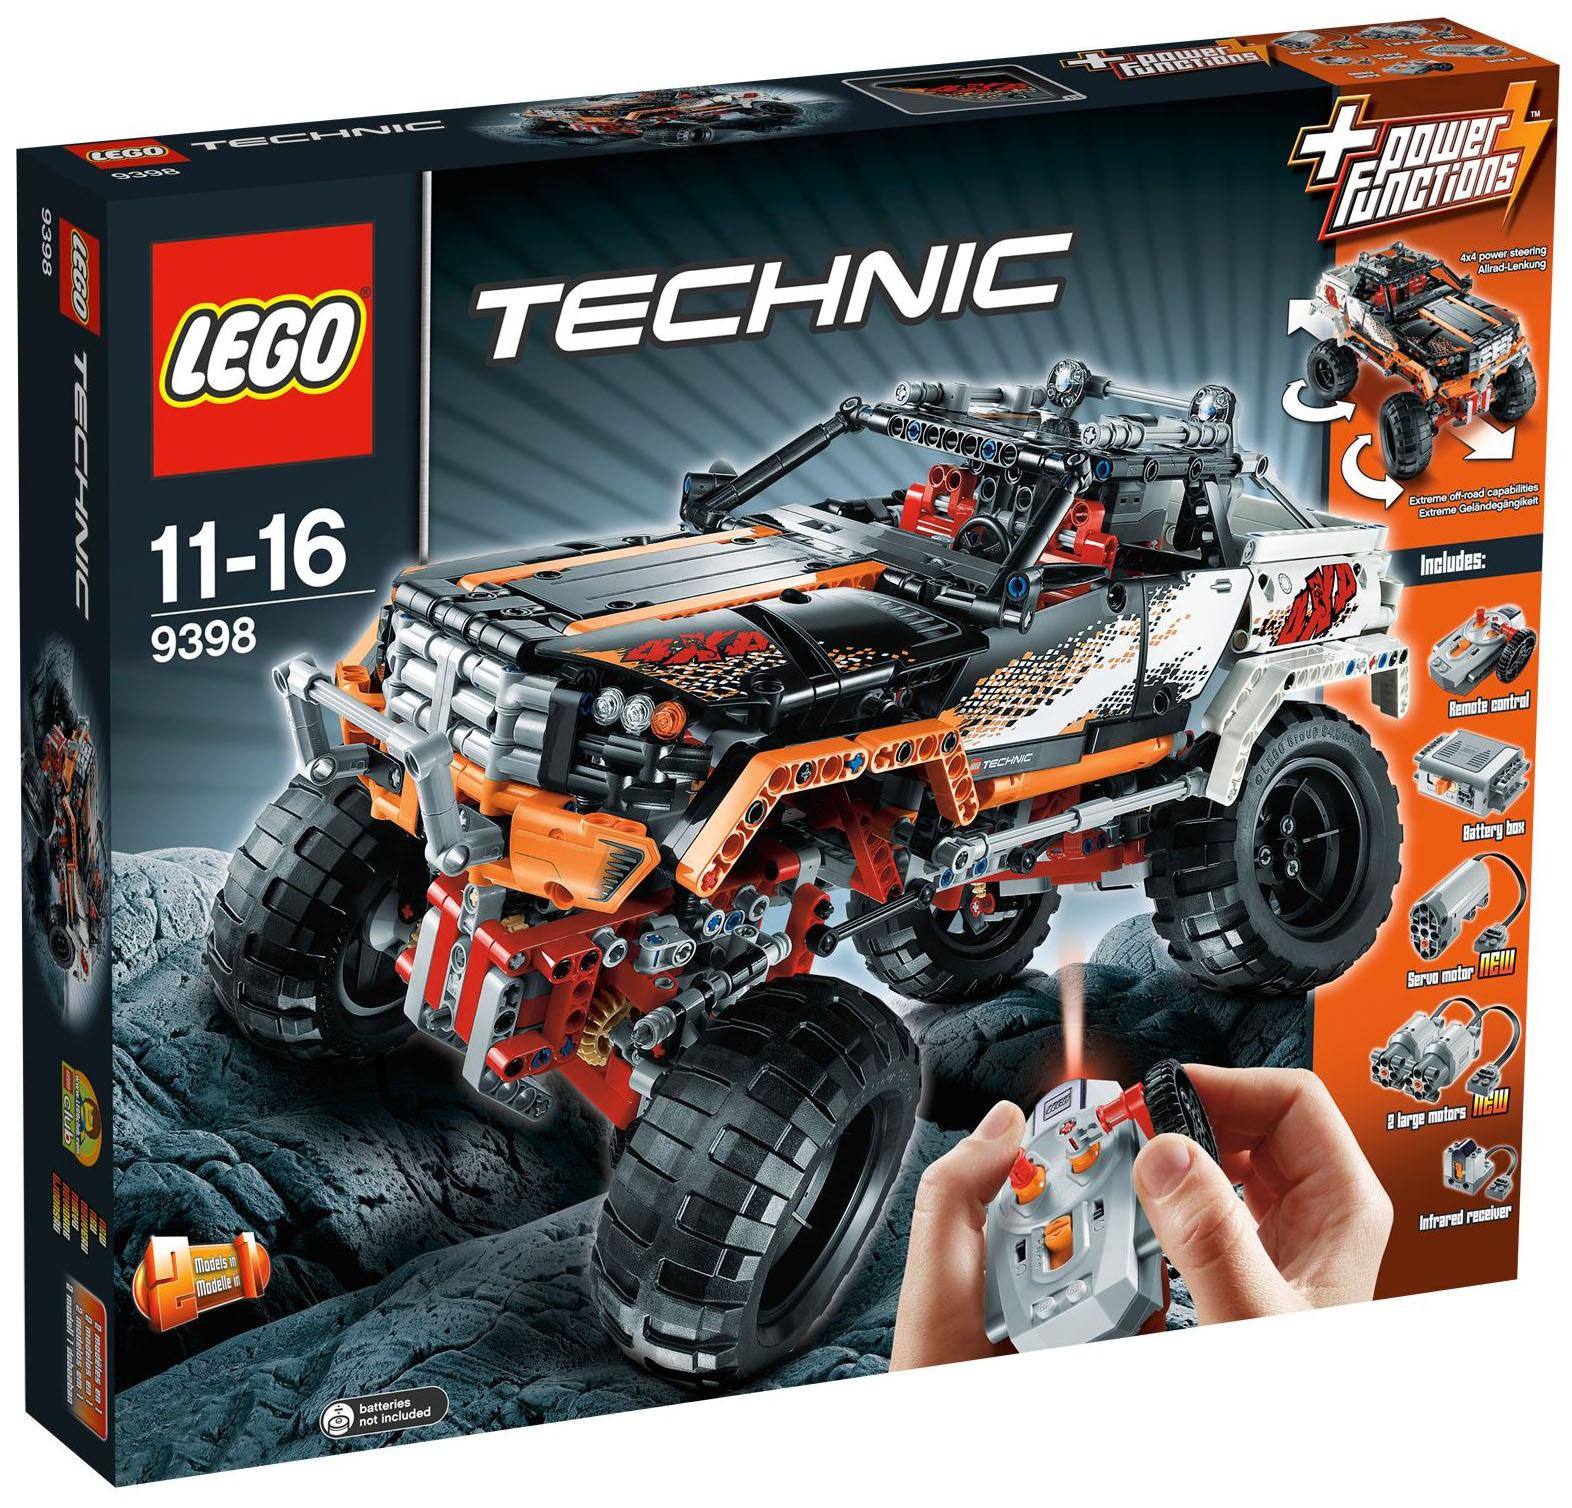 lego technic 9398 pas cher le 4x4 crawler. Black Bedroom Furniture Sets. Home Design Ideas